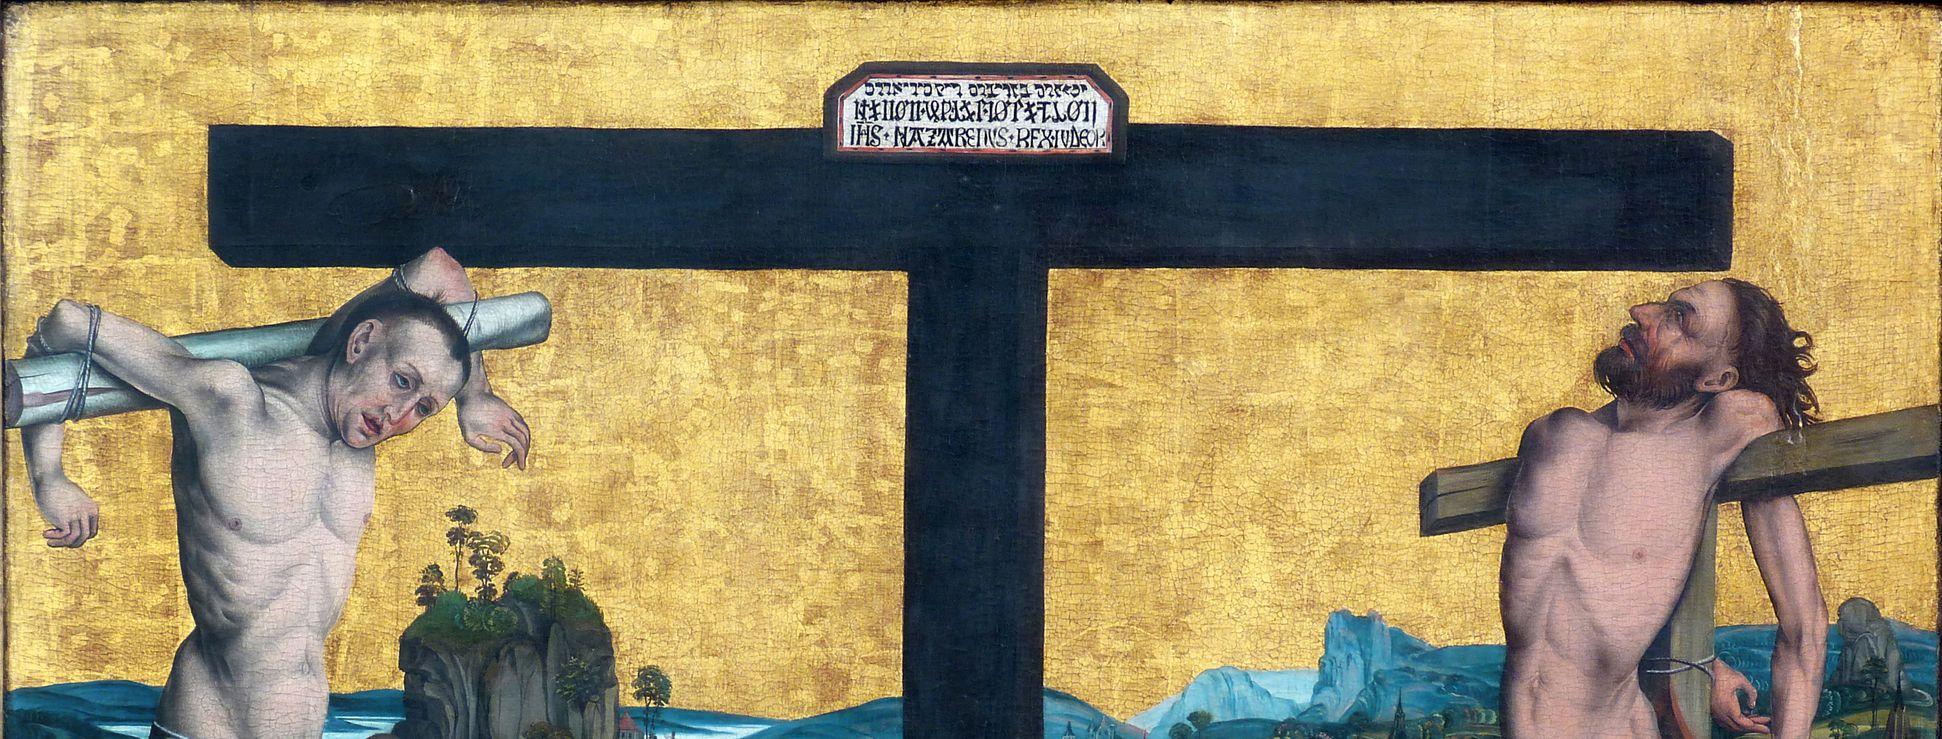 Epitaph für Georg Keyper Kreuz mit Inschrift, links Dismas, rechts Gismas